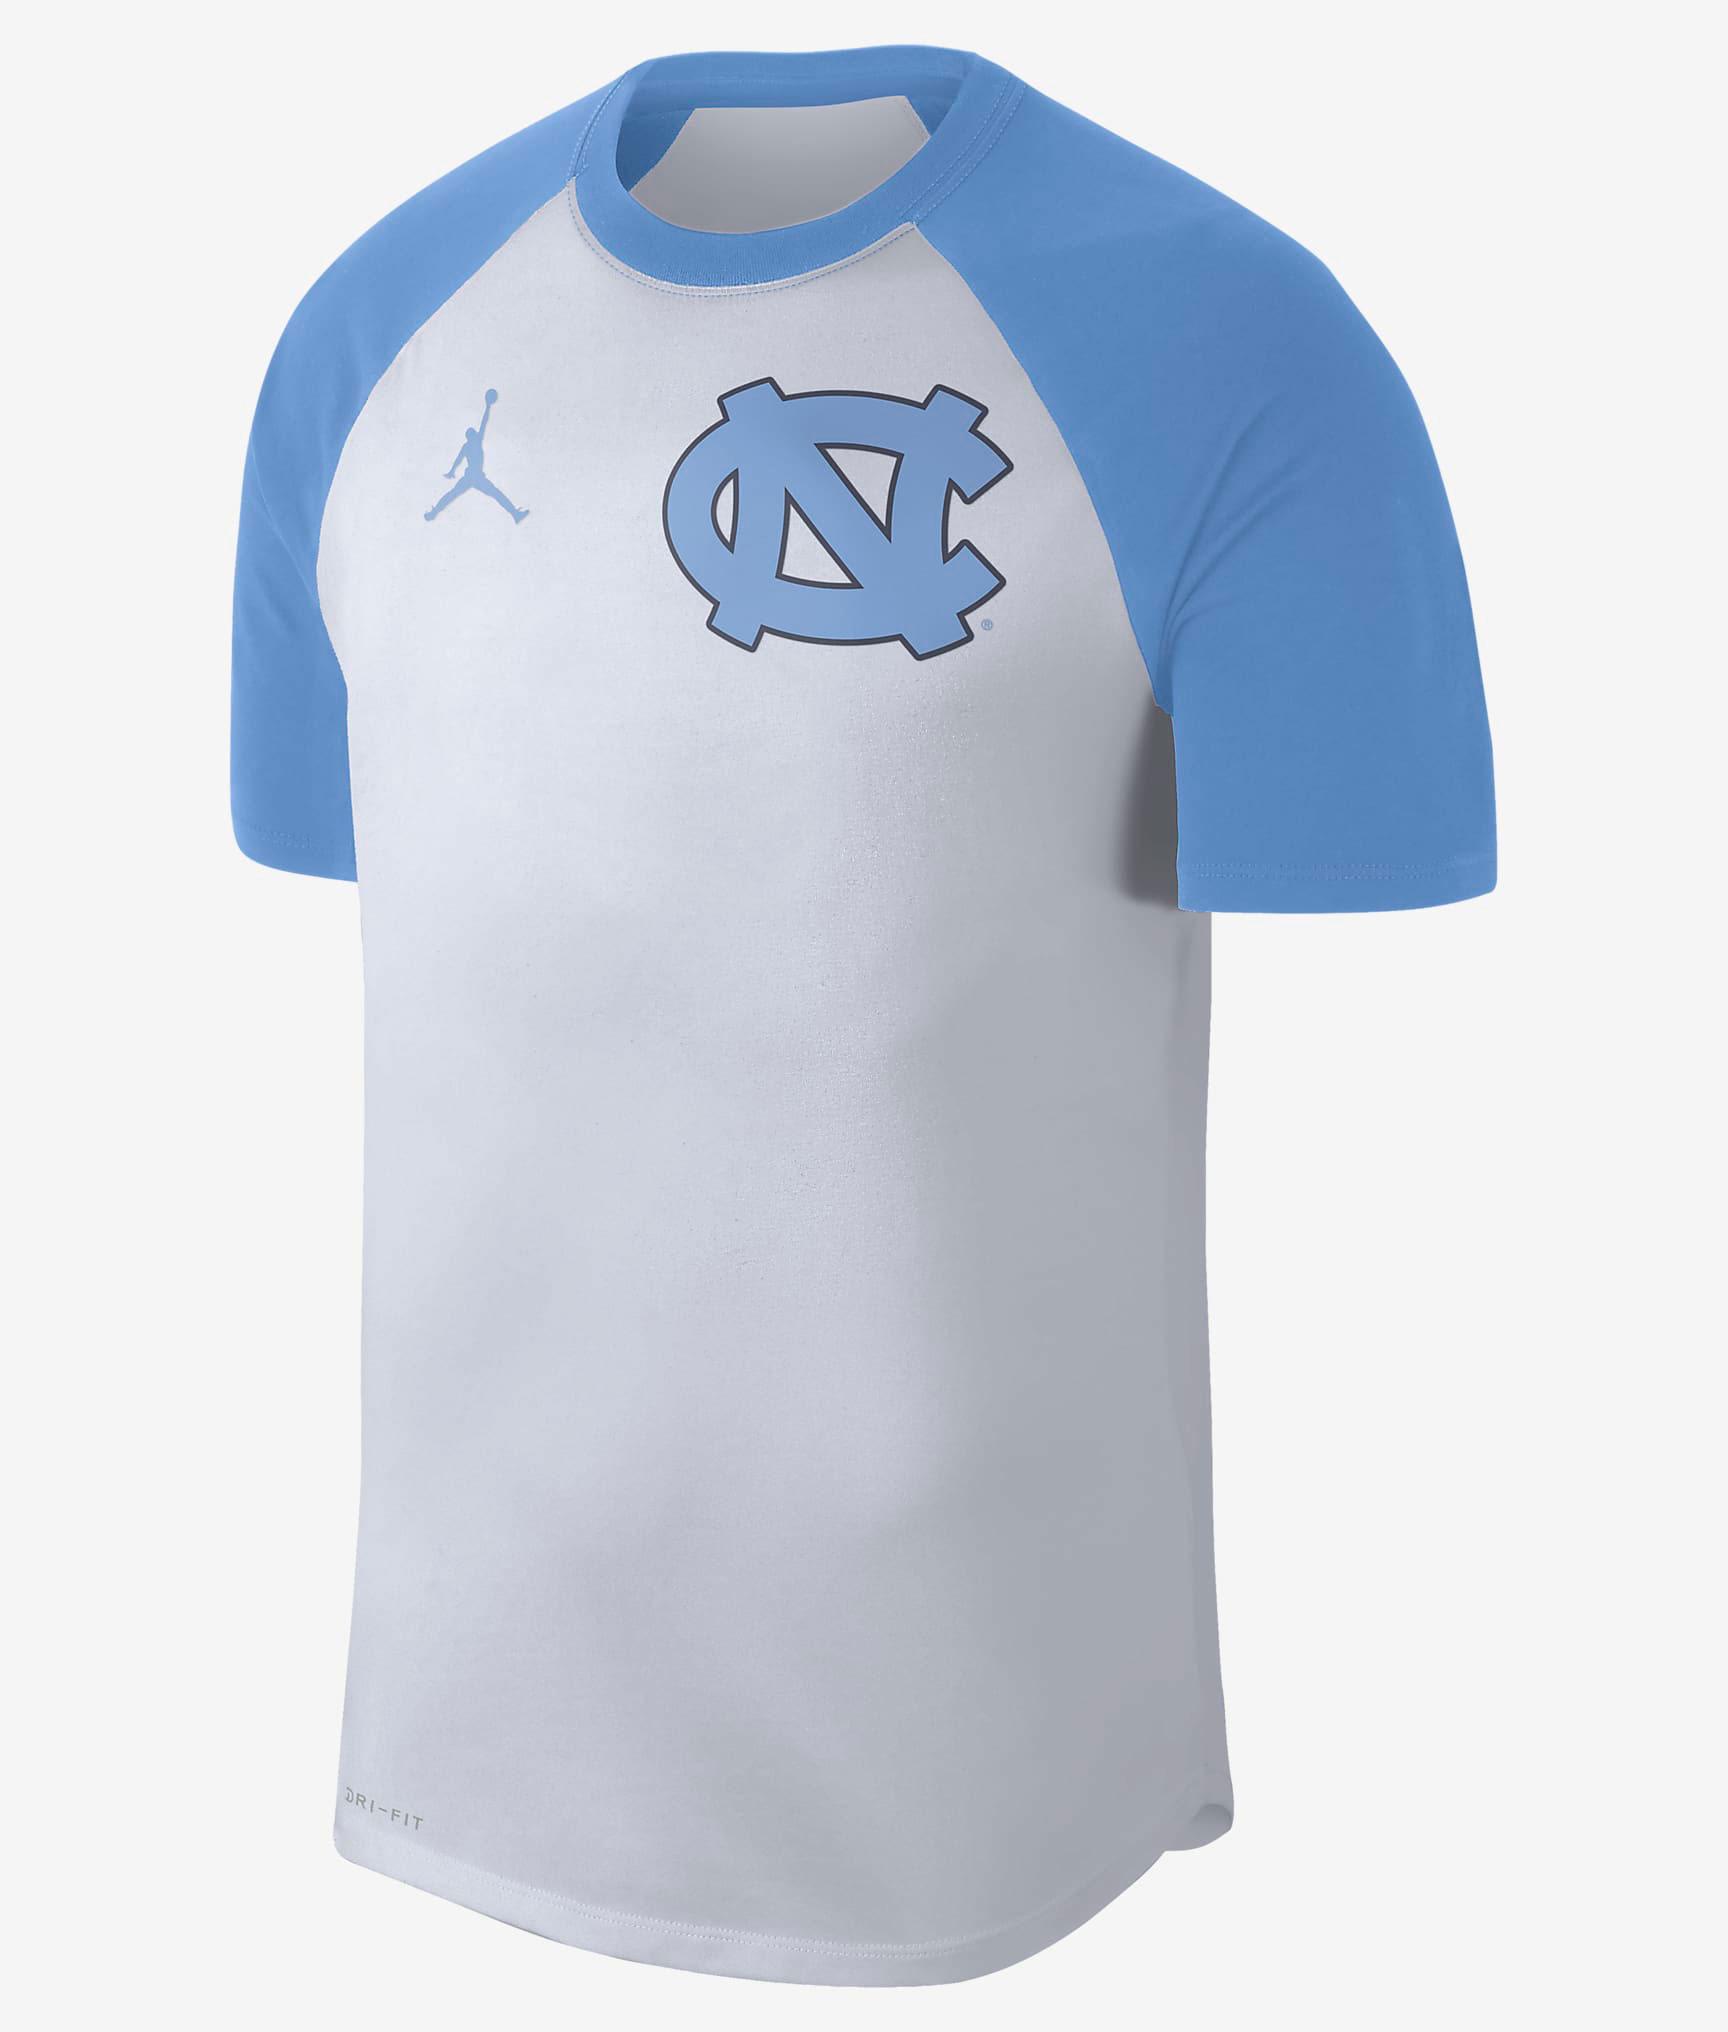 jordan-9-university-blue-unc-shirt